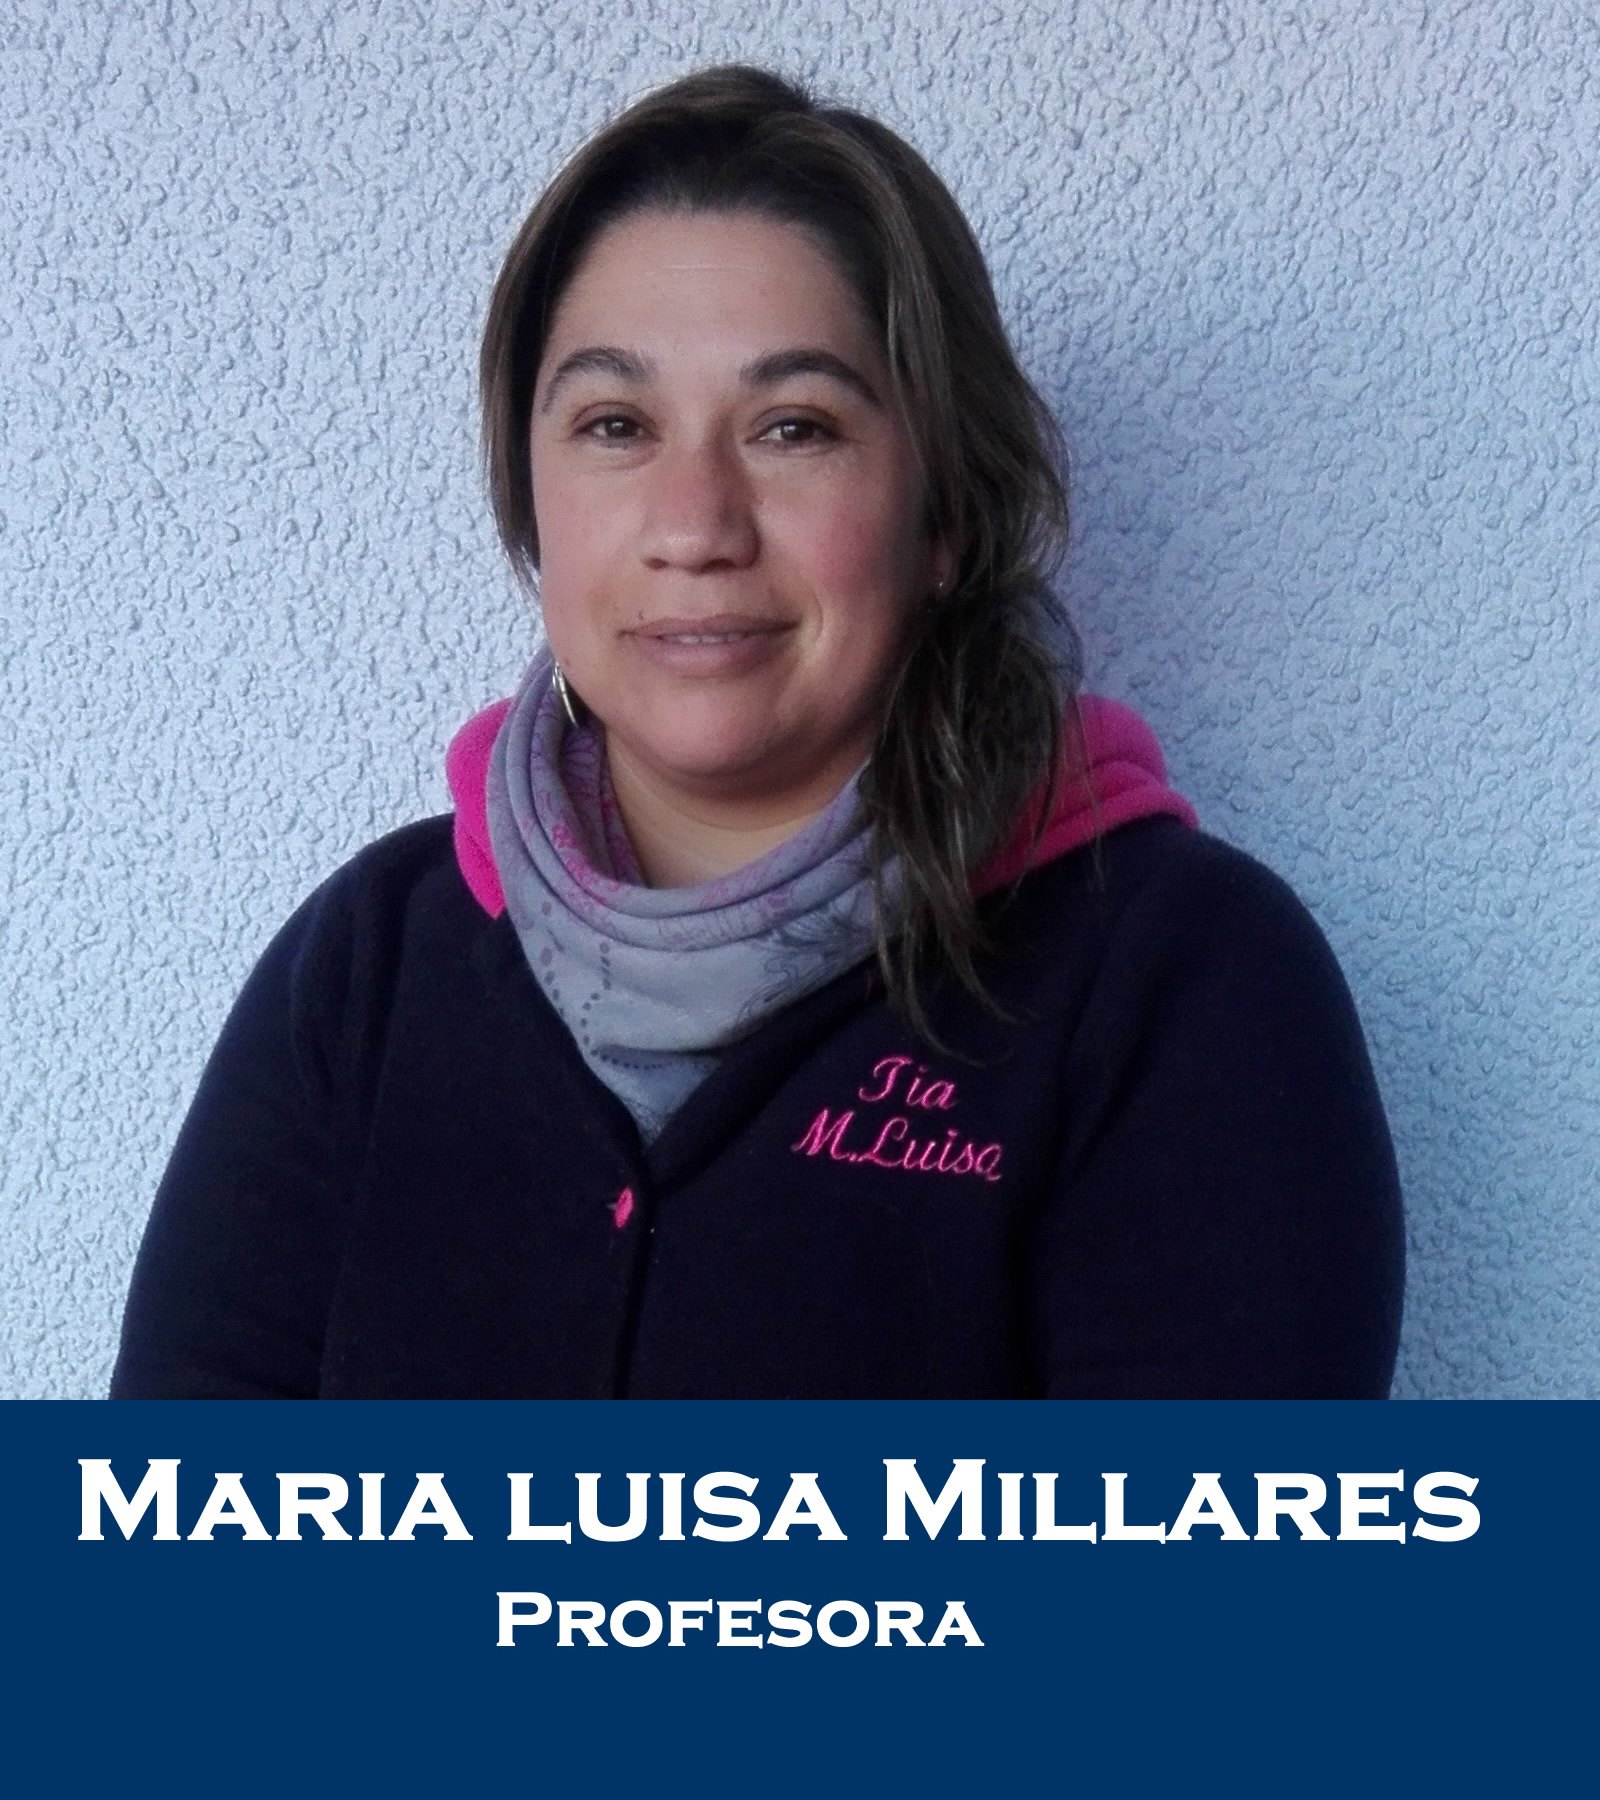 Maria-luisa-Millares